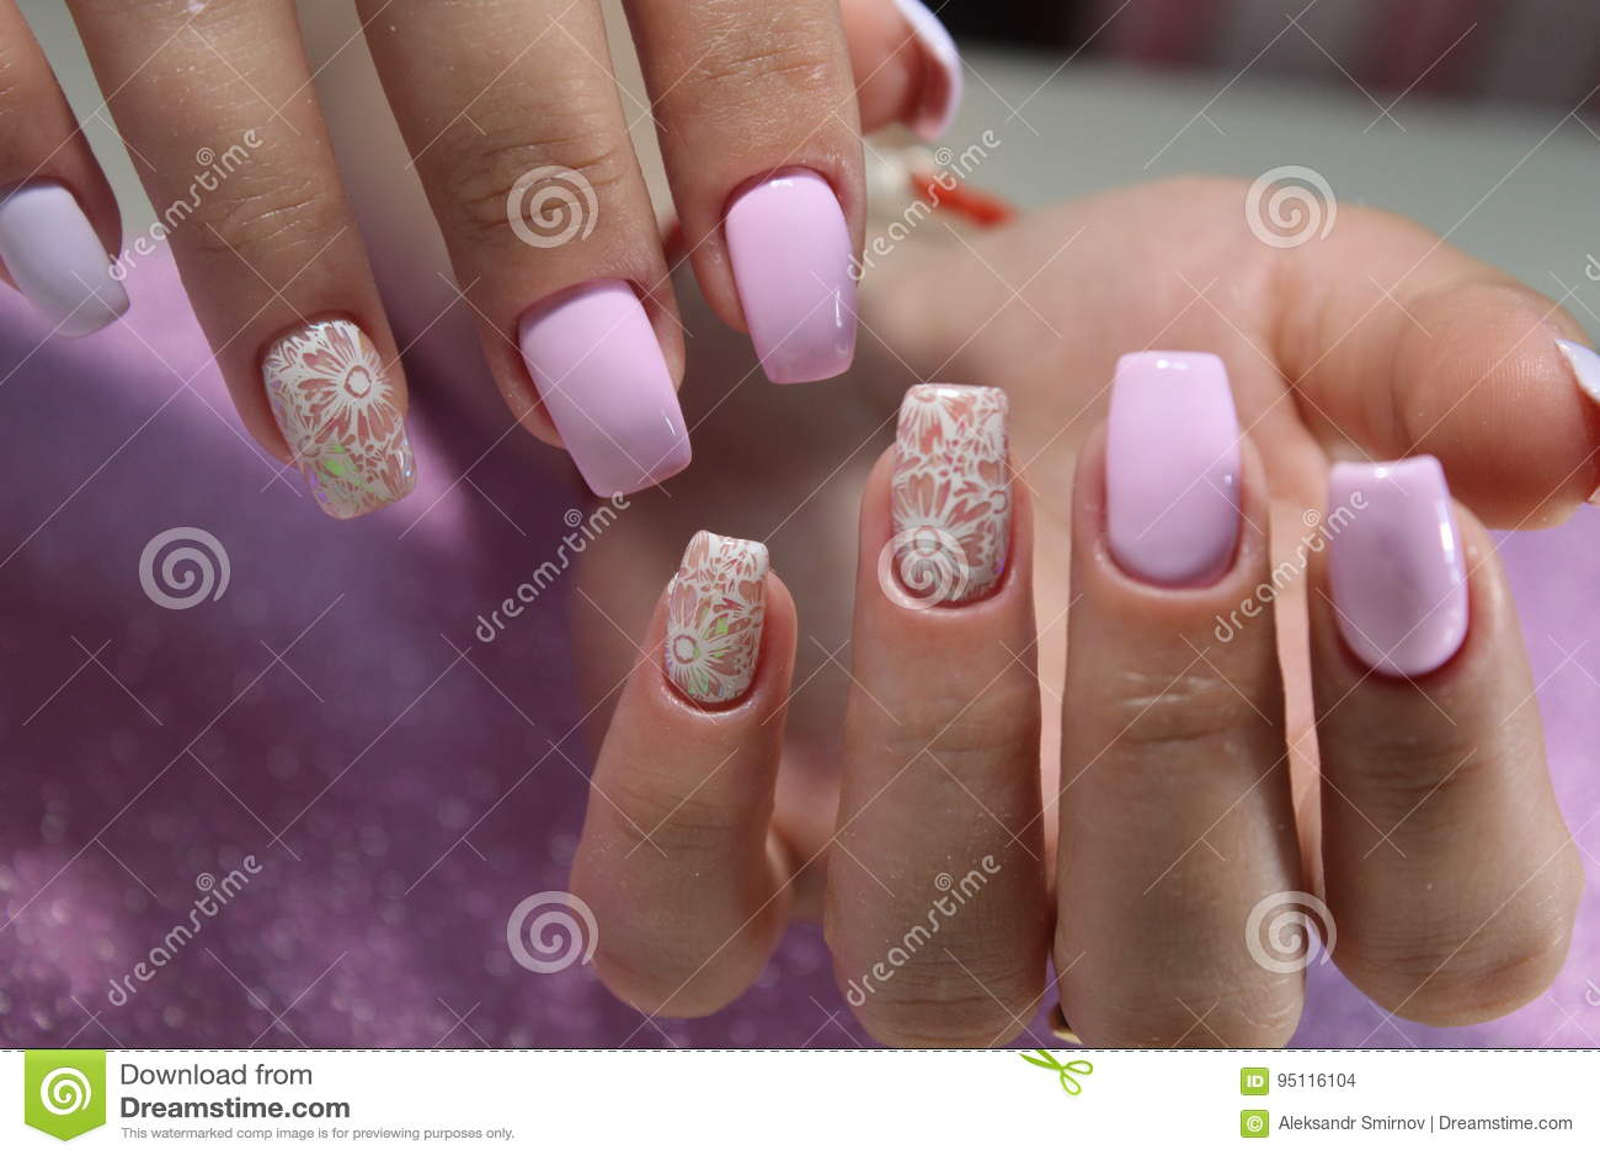 Manicure Design Nail Polish Gel Stock Photo Image Of